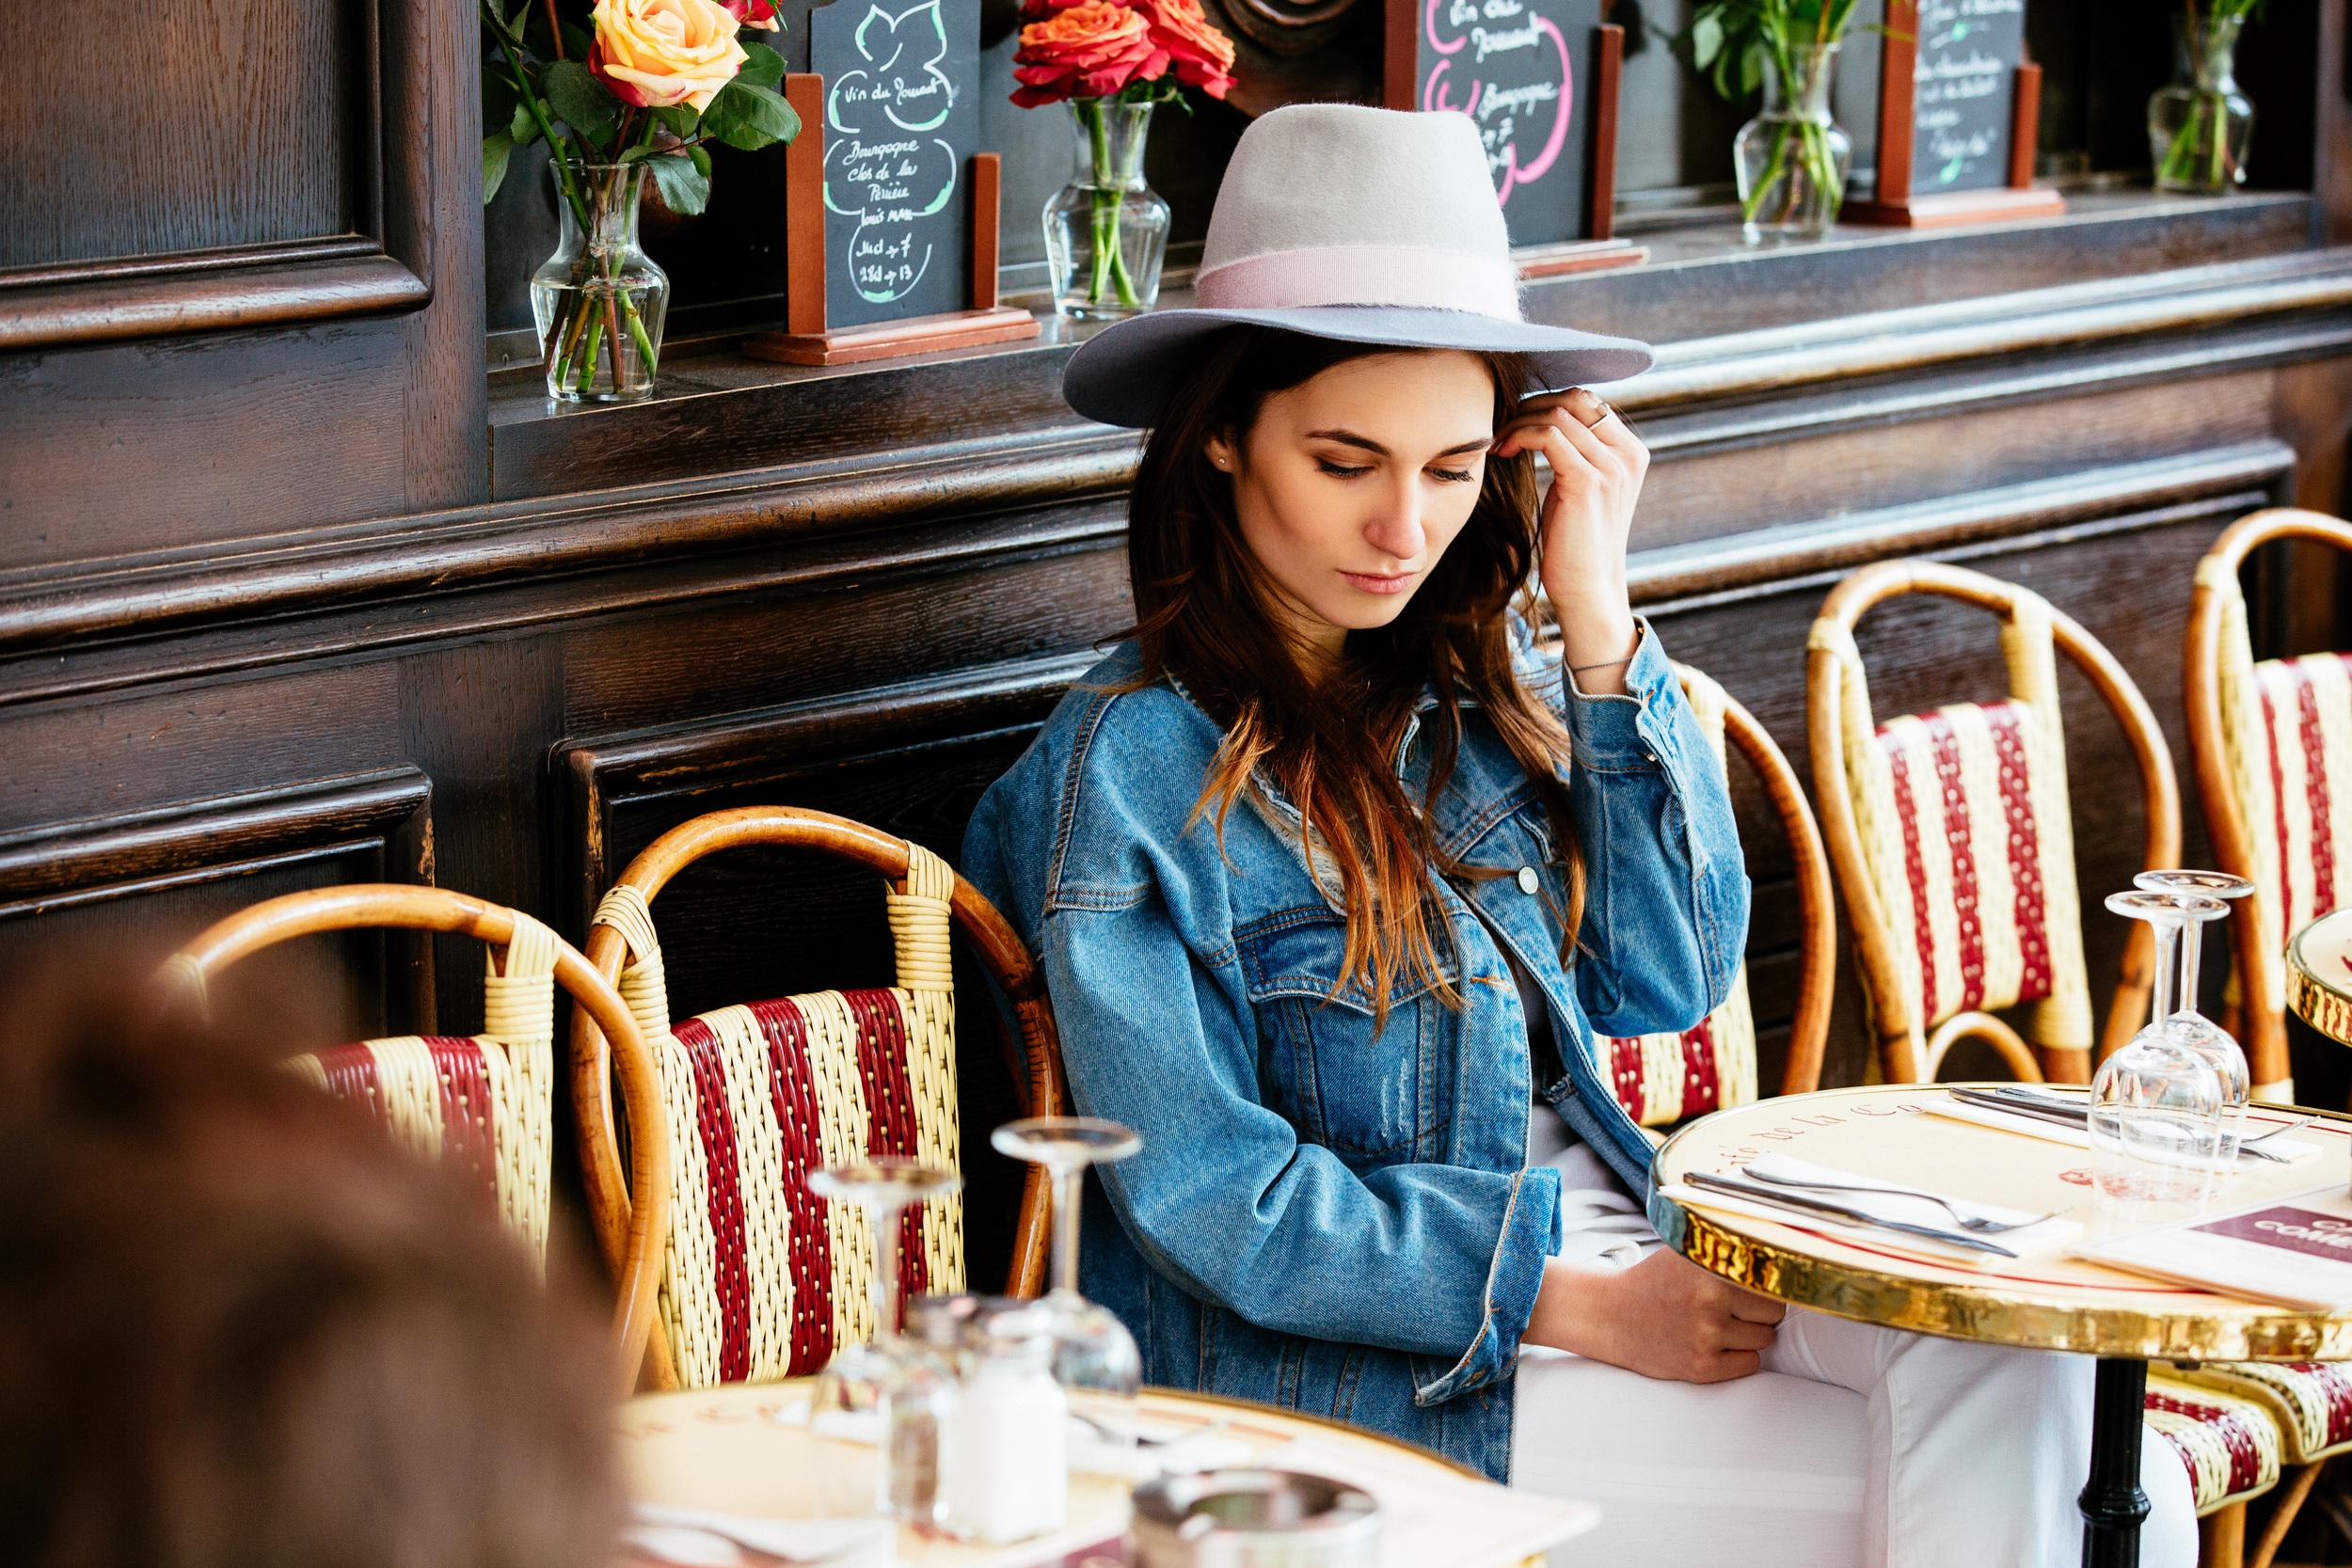 Photographer in Paris, portrait, Cafe in Paris, portrait, Brand, Lookbook, Iheartparisfr